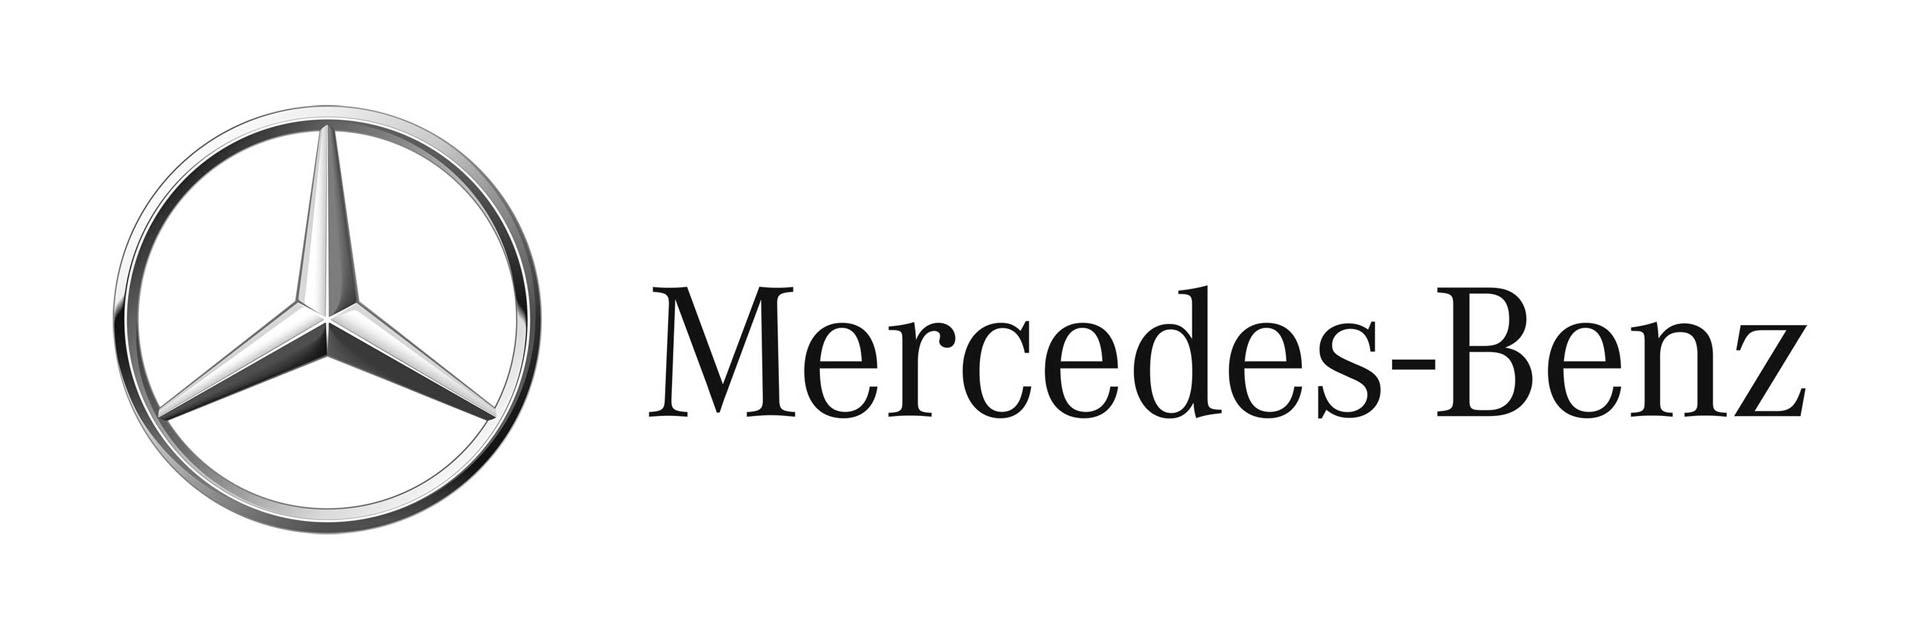 Logo mercedes tous les logos for Logo mercedes benz